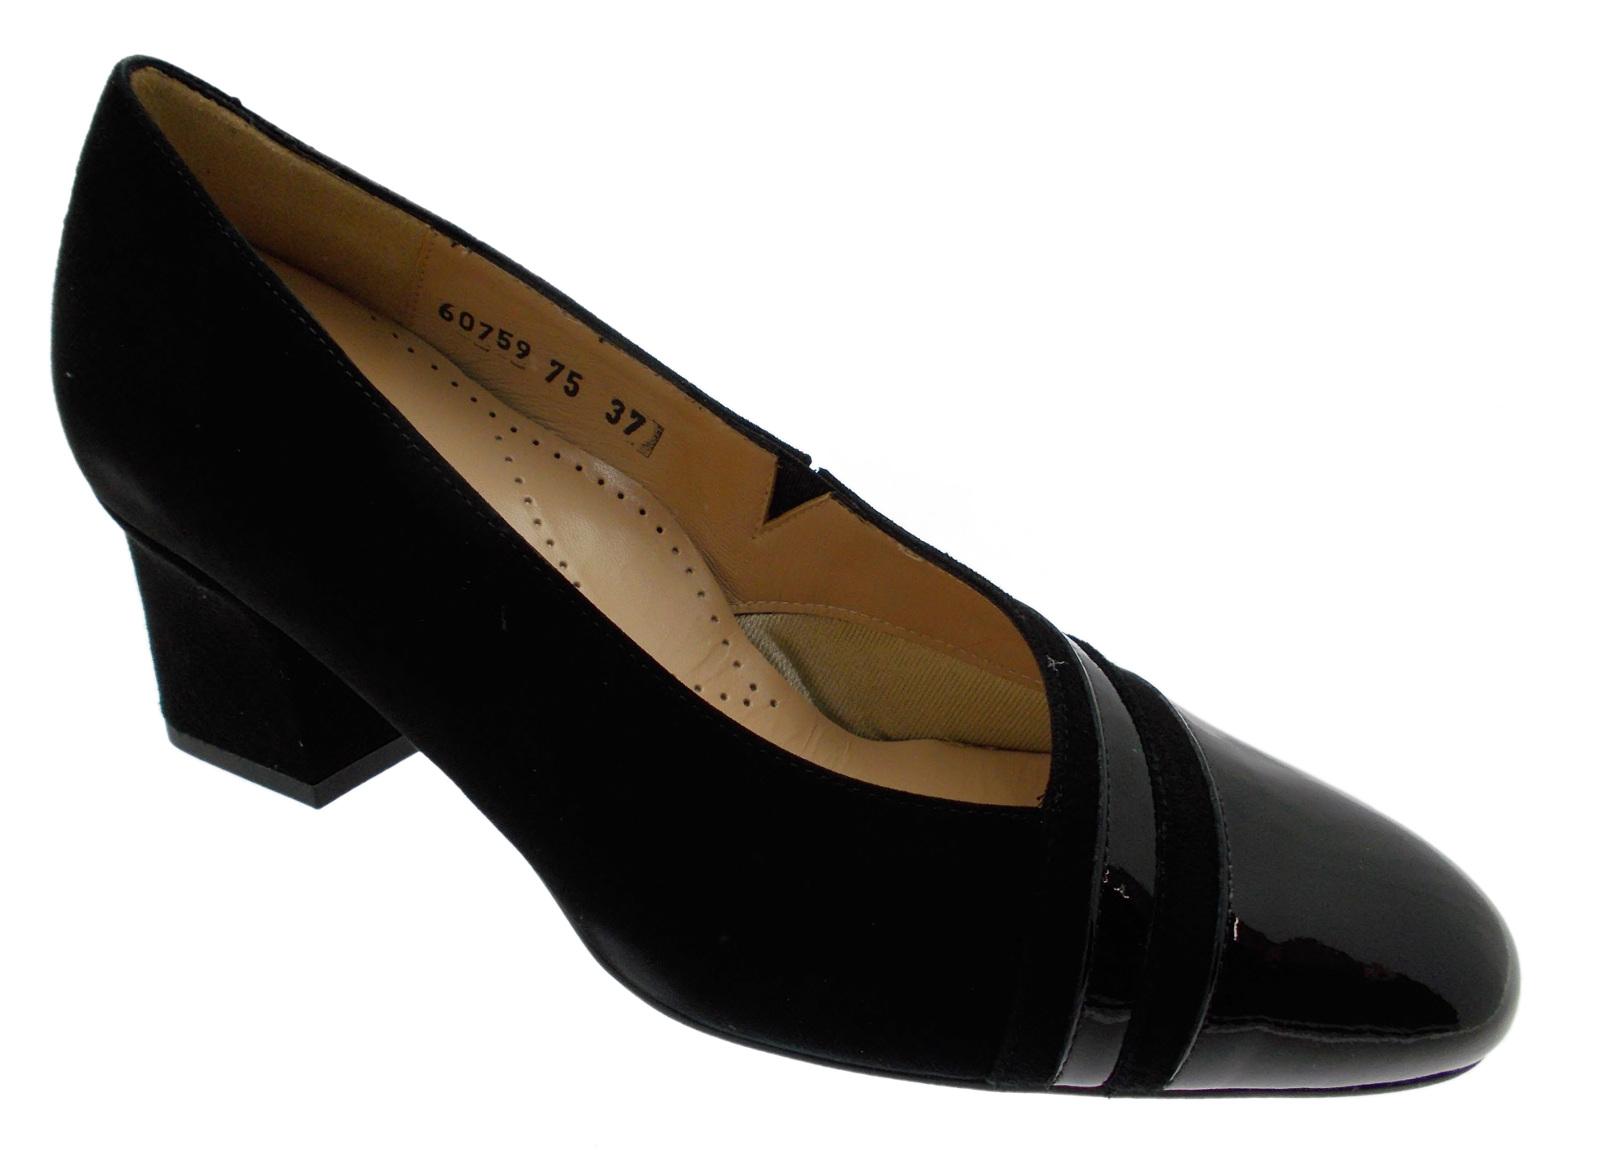 Image is loading 60759-black-camouflaged-orthopedic-painted-boots-Loren